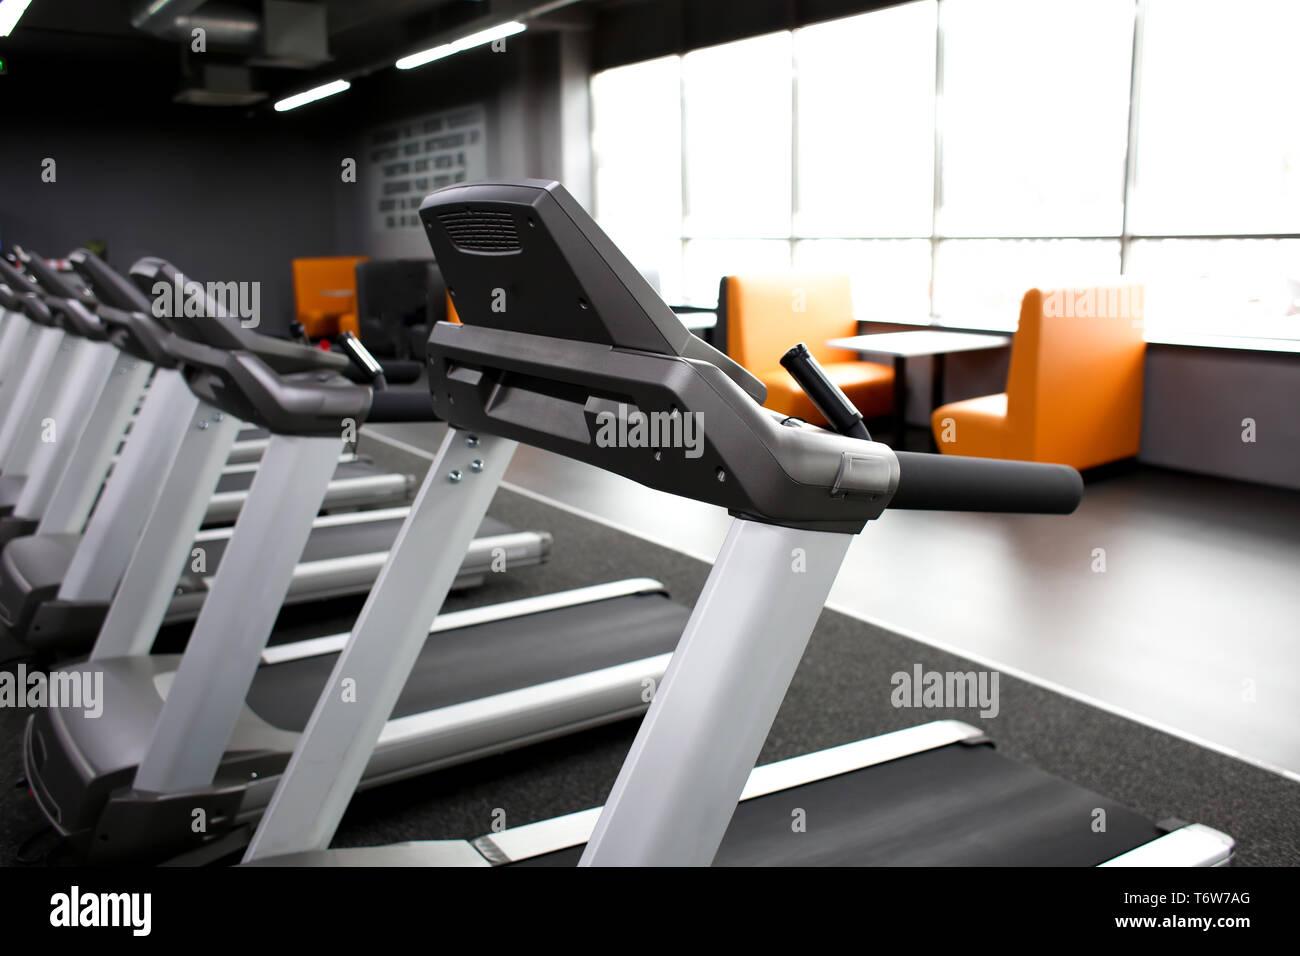 Modern treadmills in gym - Stock Image